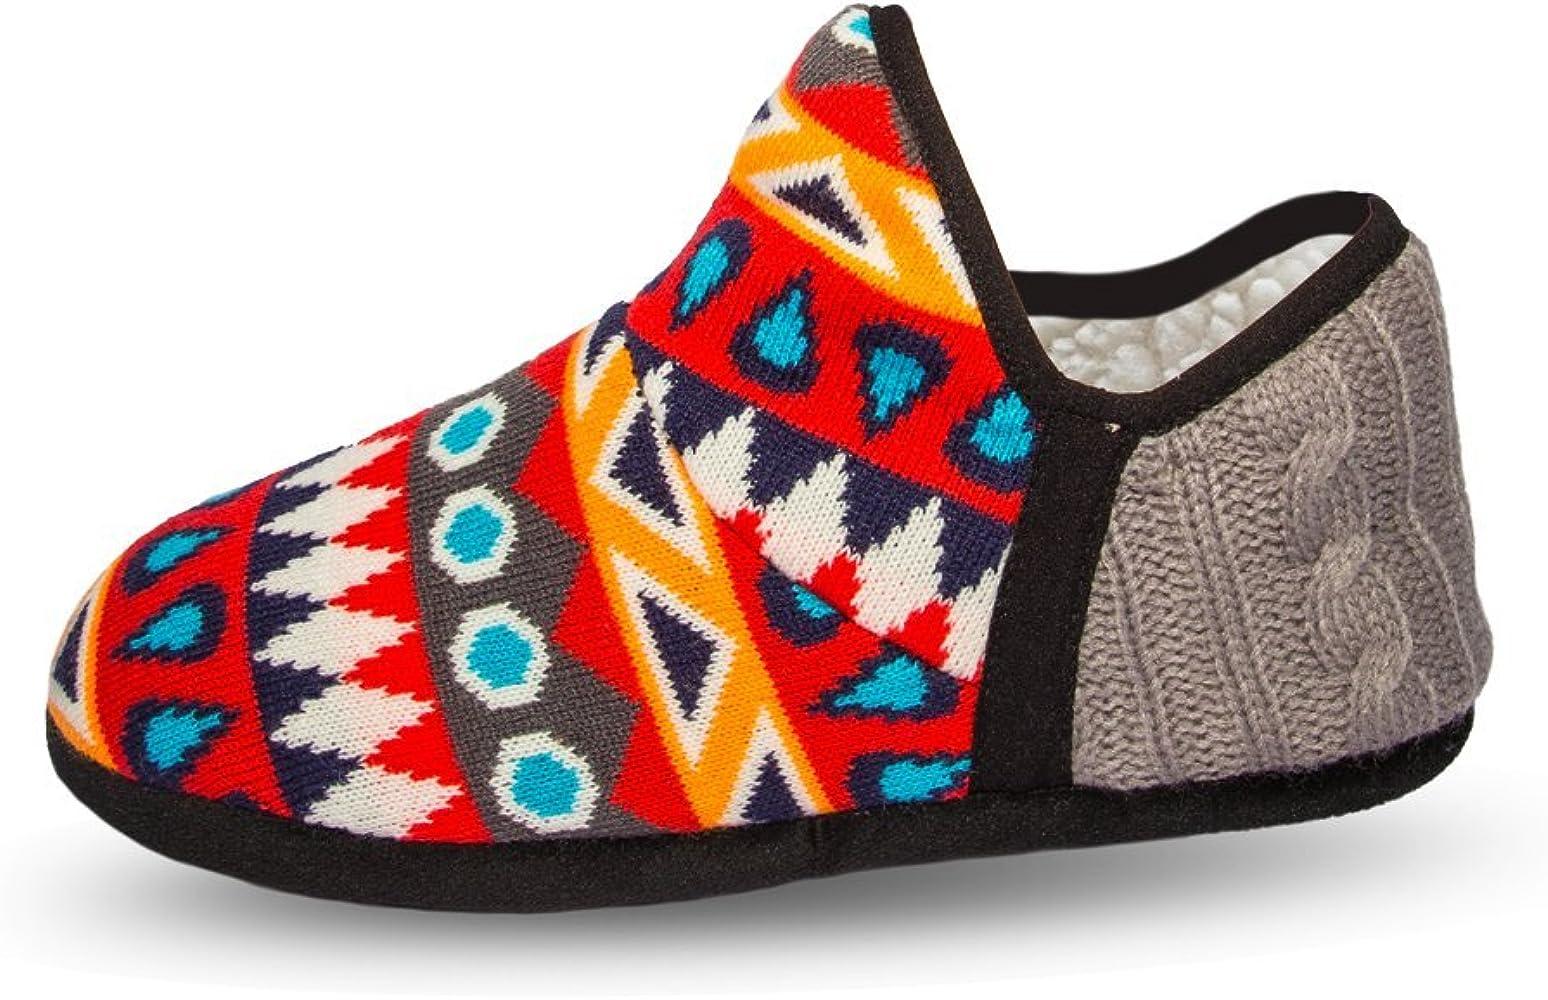 Pudus unisex adult cozy memory foam winter slippers sherpa lining, indooroutdoor anti skid hard sole